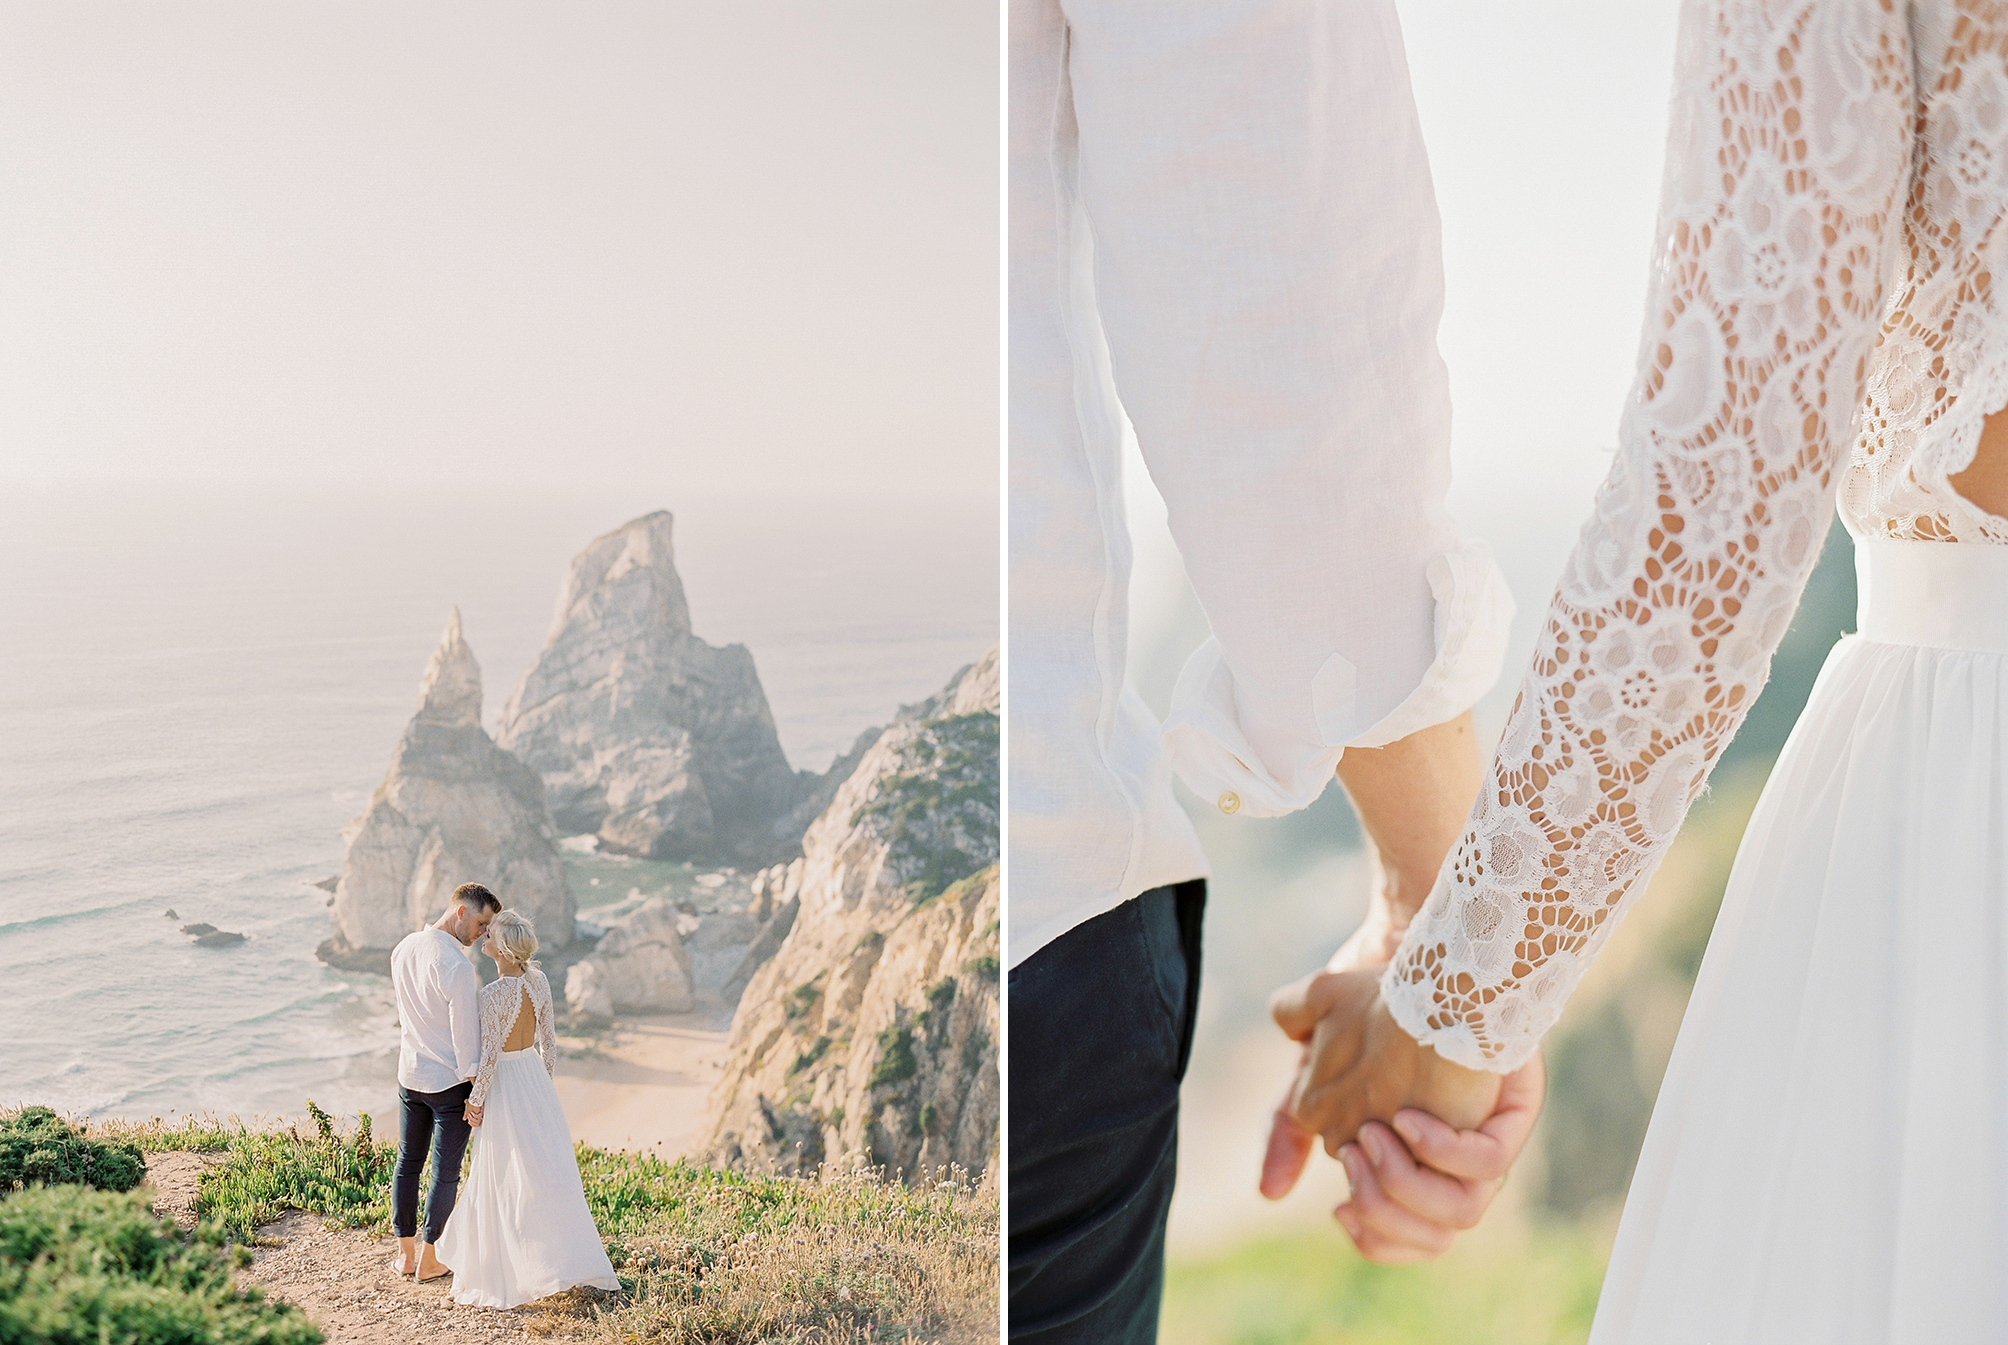 Nastia_Vesna_Pre_Wedding_Portugal_3.jpg